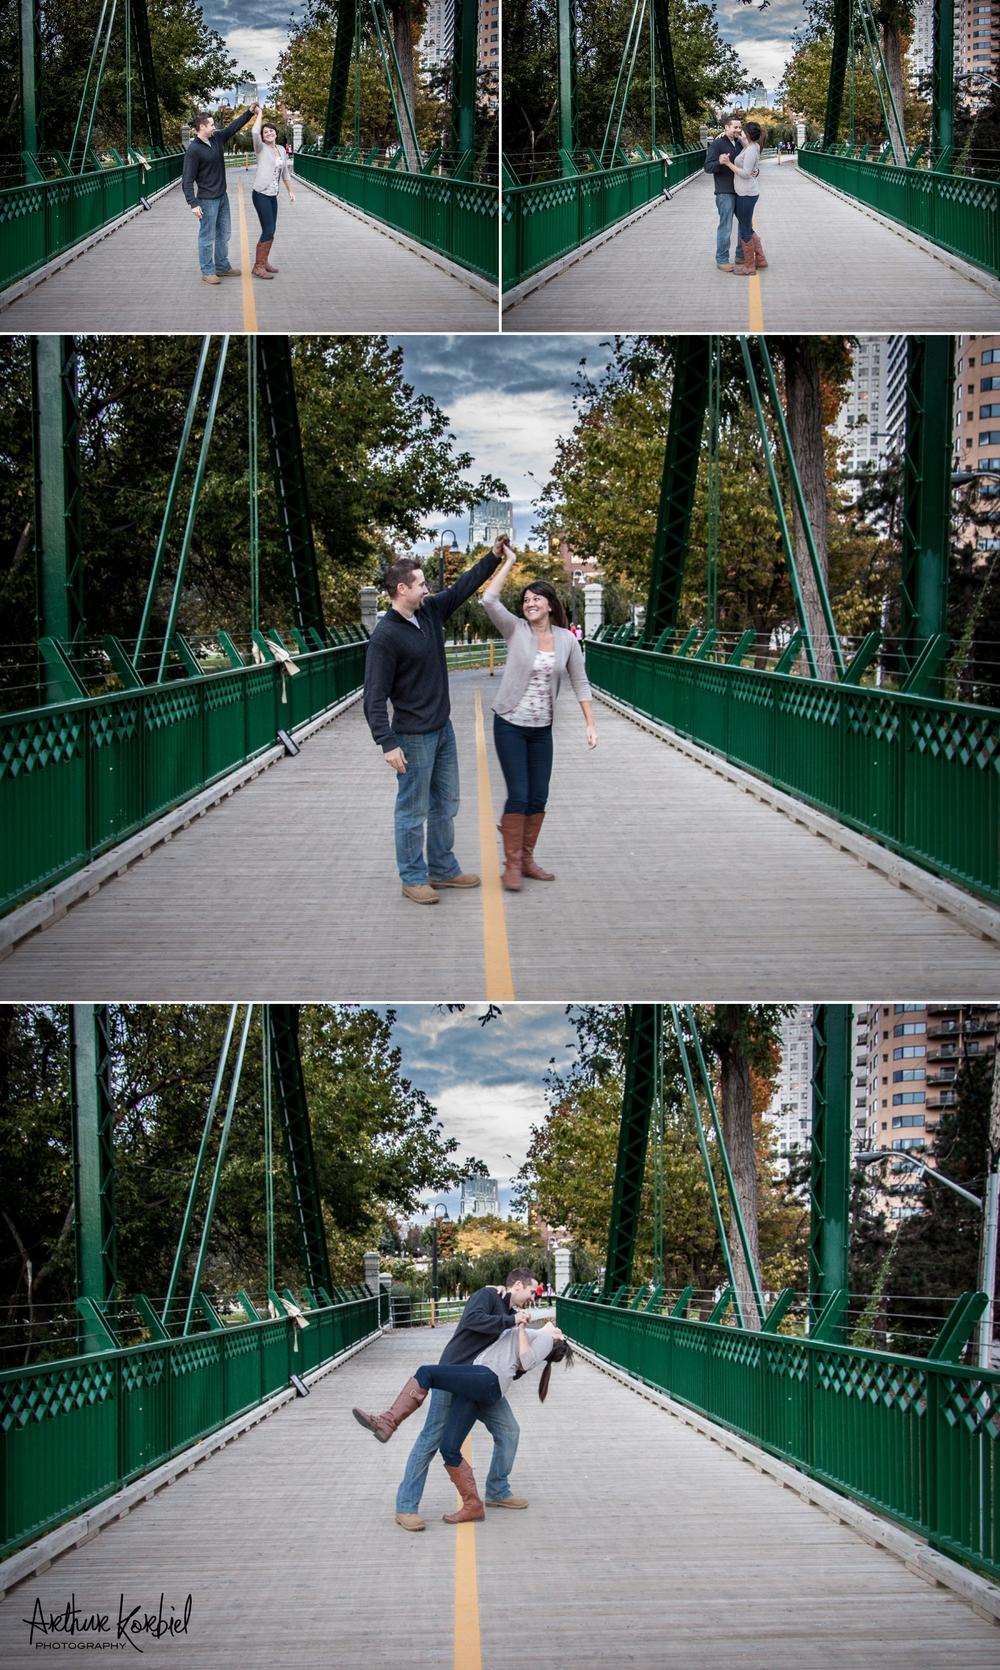 Arthur Korbiel Photography - London Engagement Photographer - Katie & Mike_007.jpg